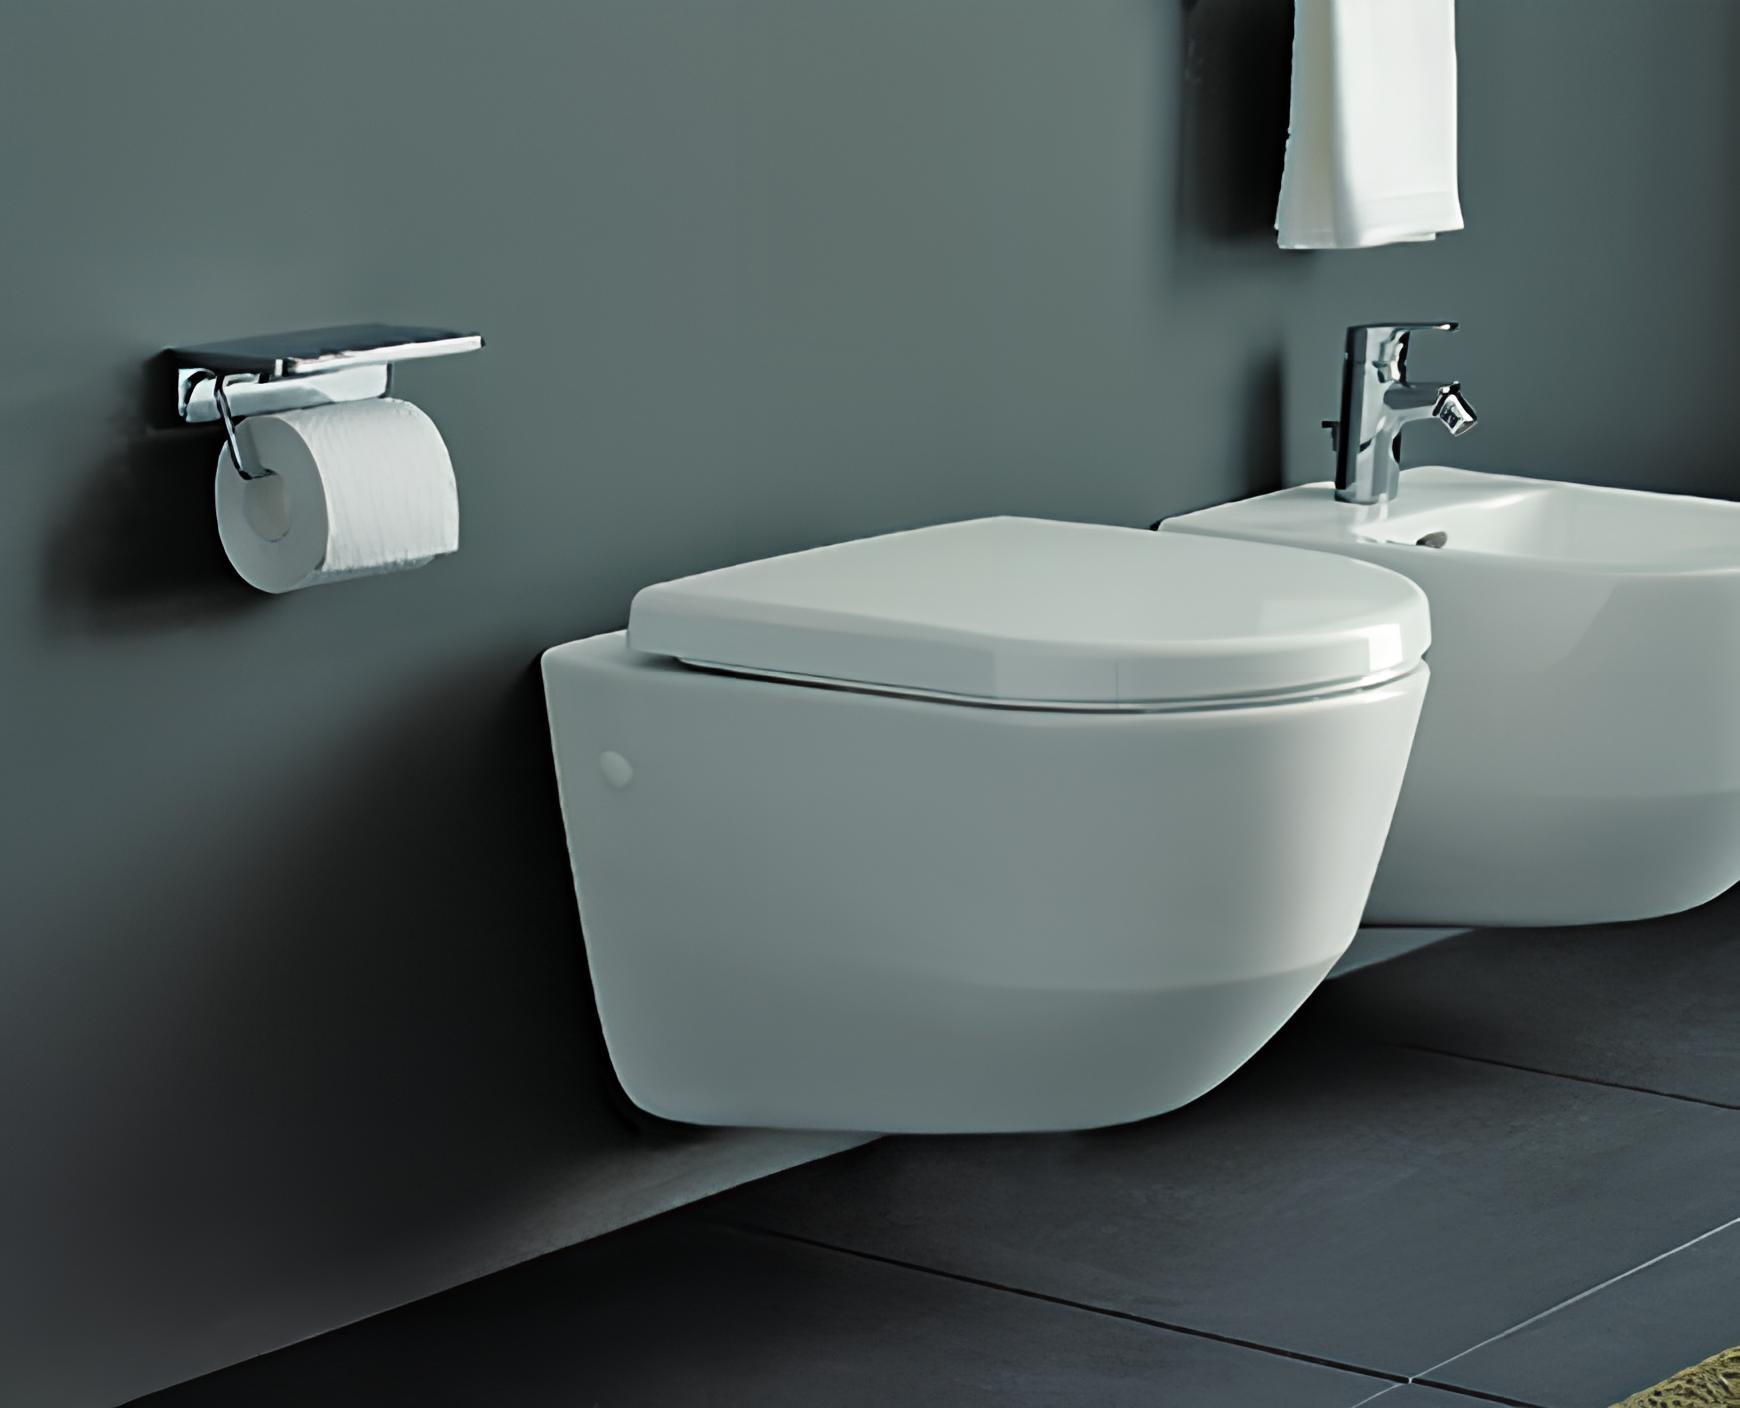 wc laufen pro 360 x 530 rimless z v sn b l lcc. Black Bedroom Furniture Sets. Home Design Ideas